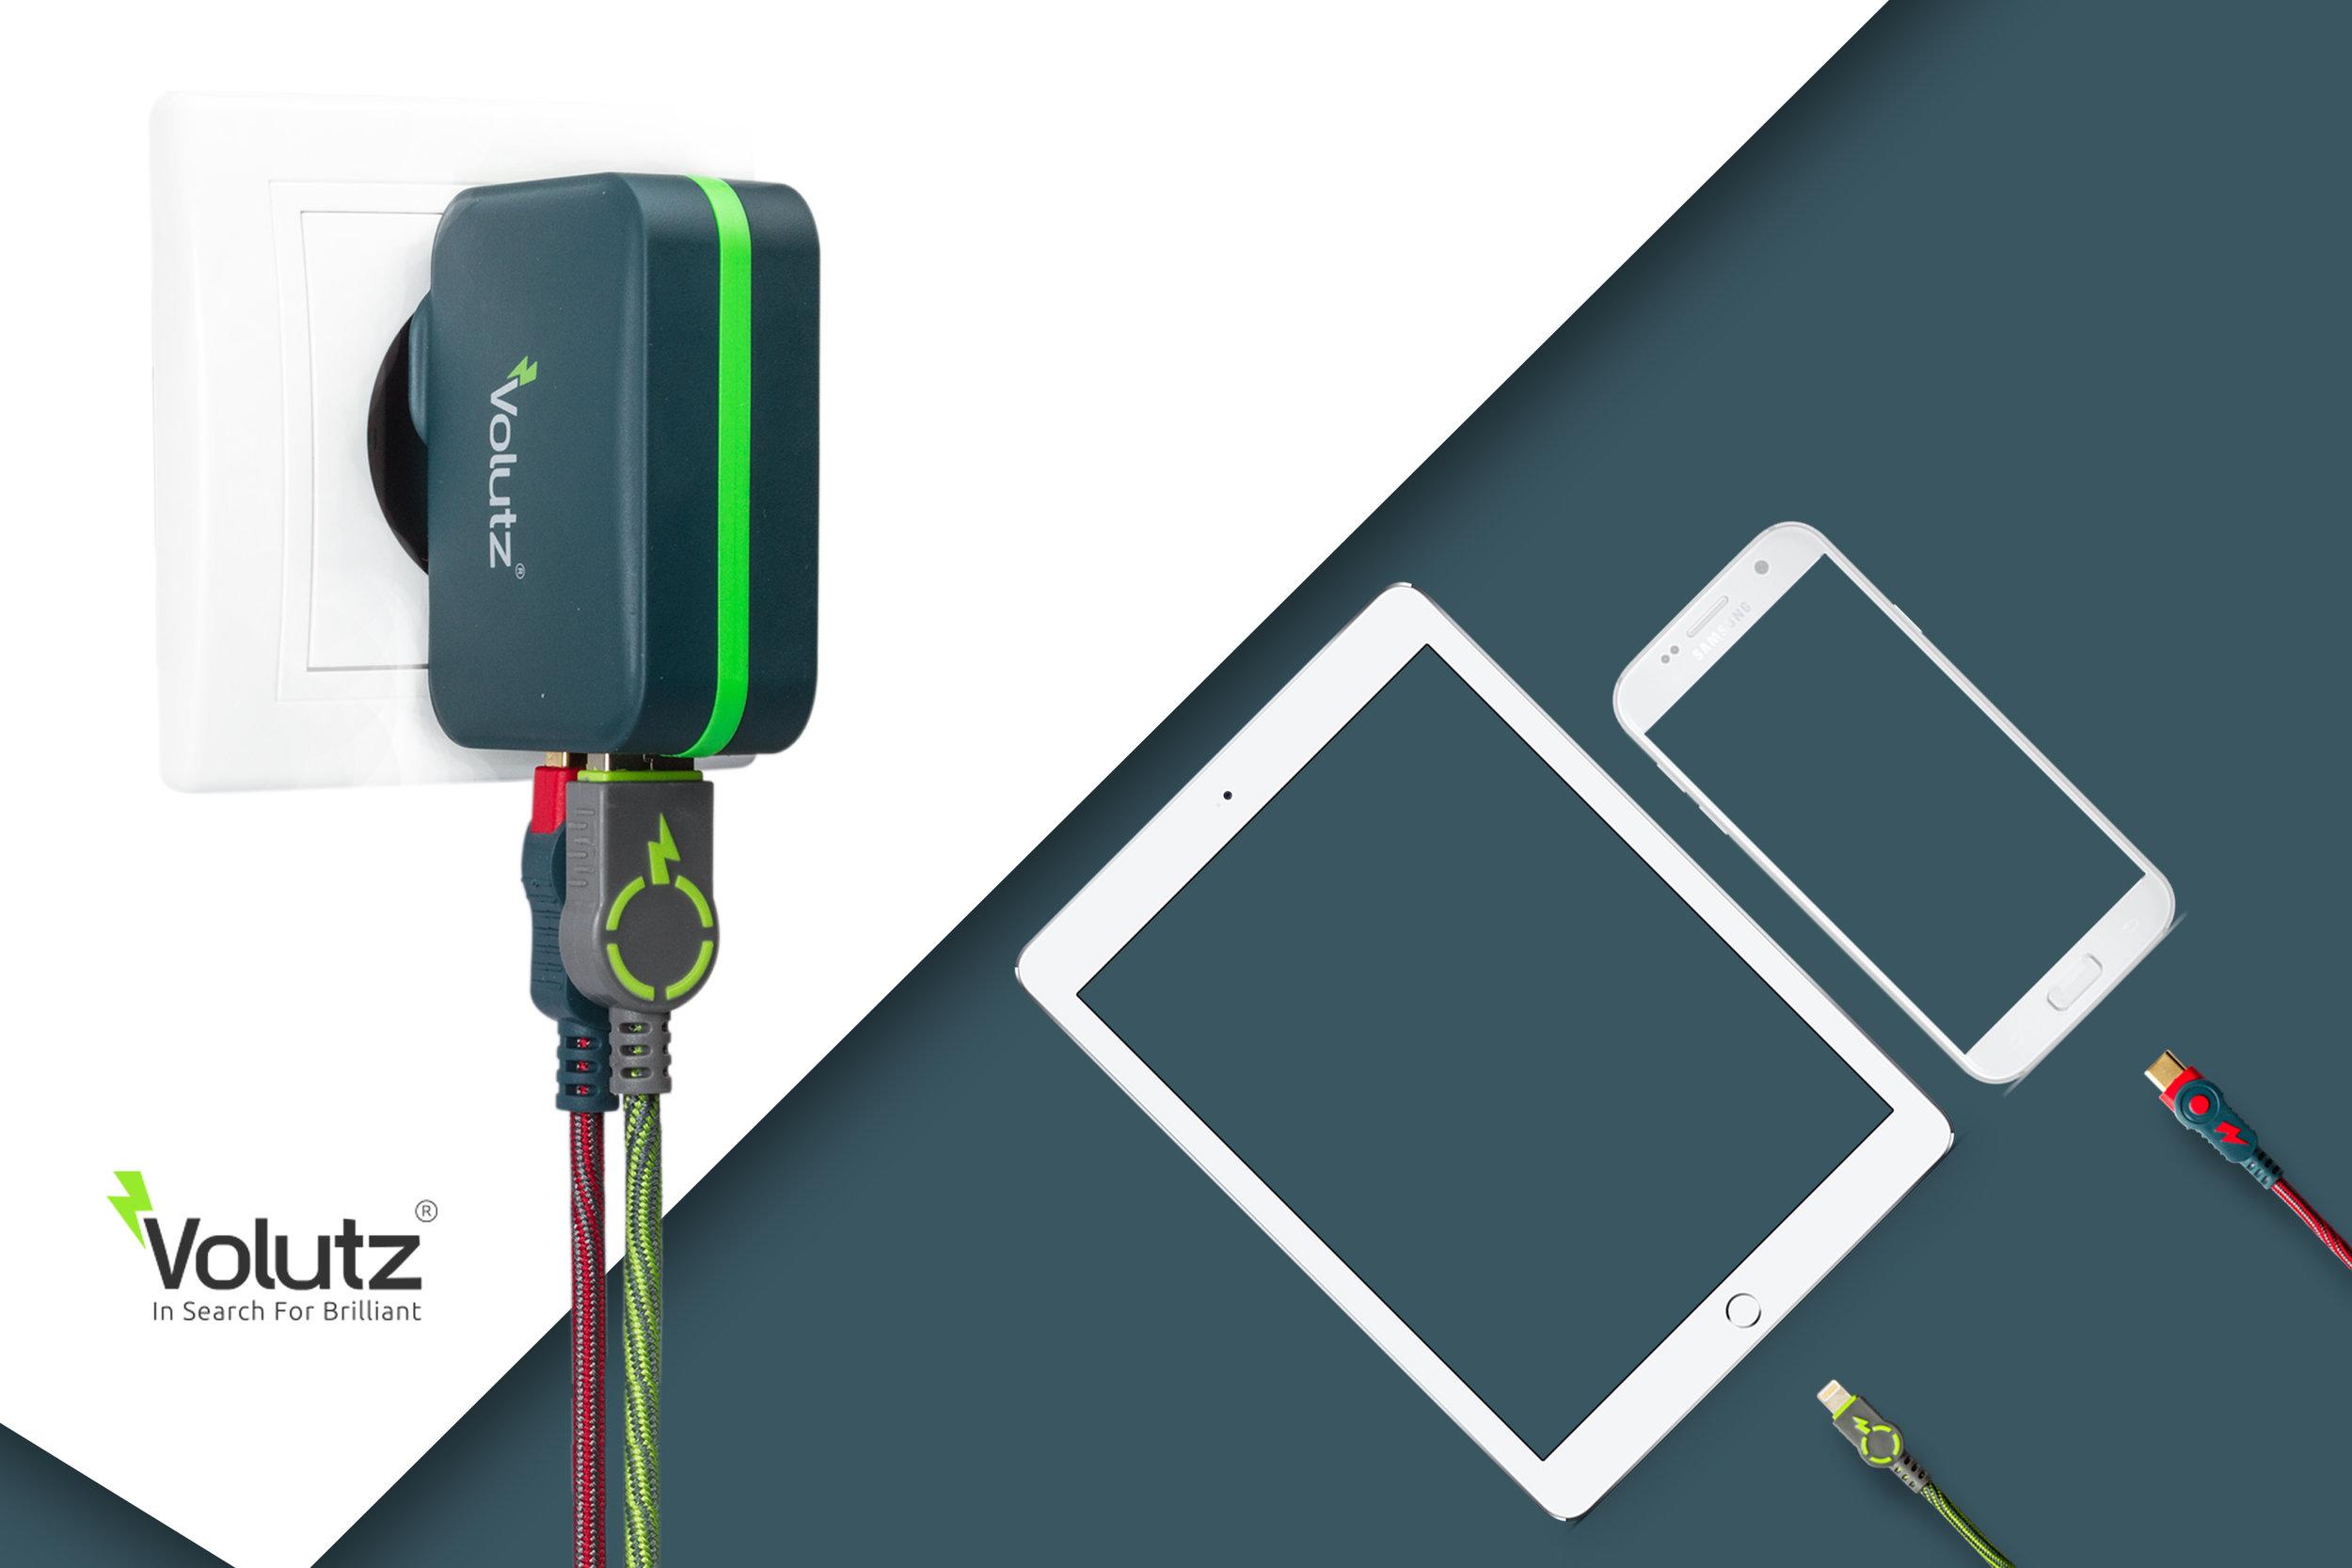 volutz-novo-kablovi-punjac-i-devices.jpg